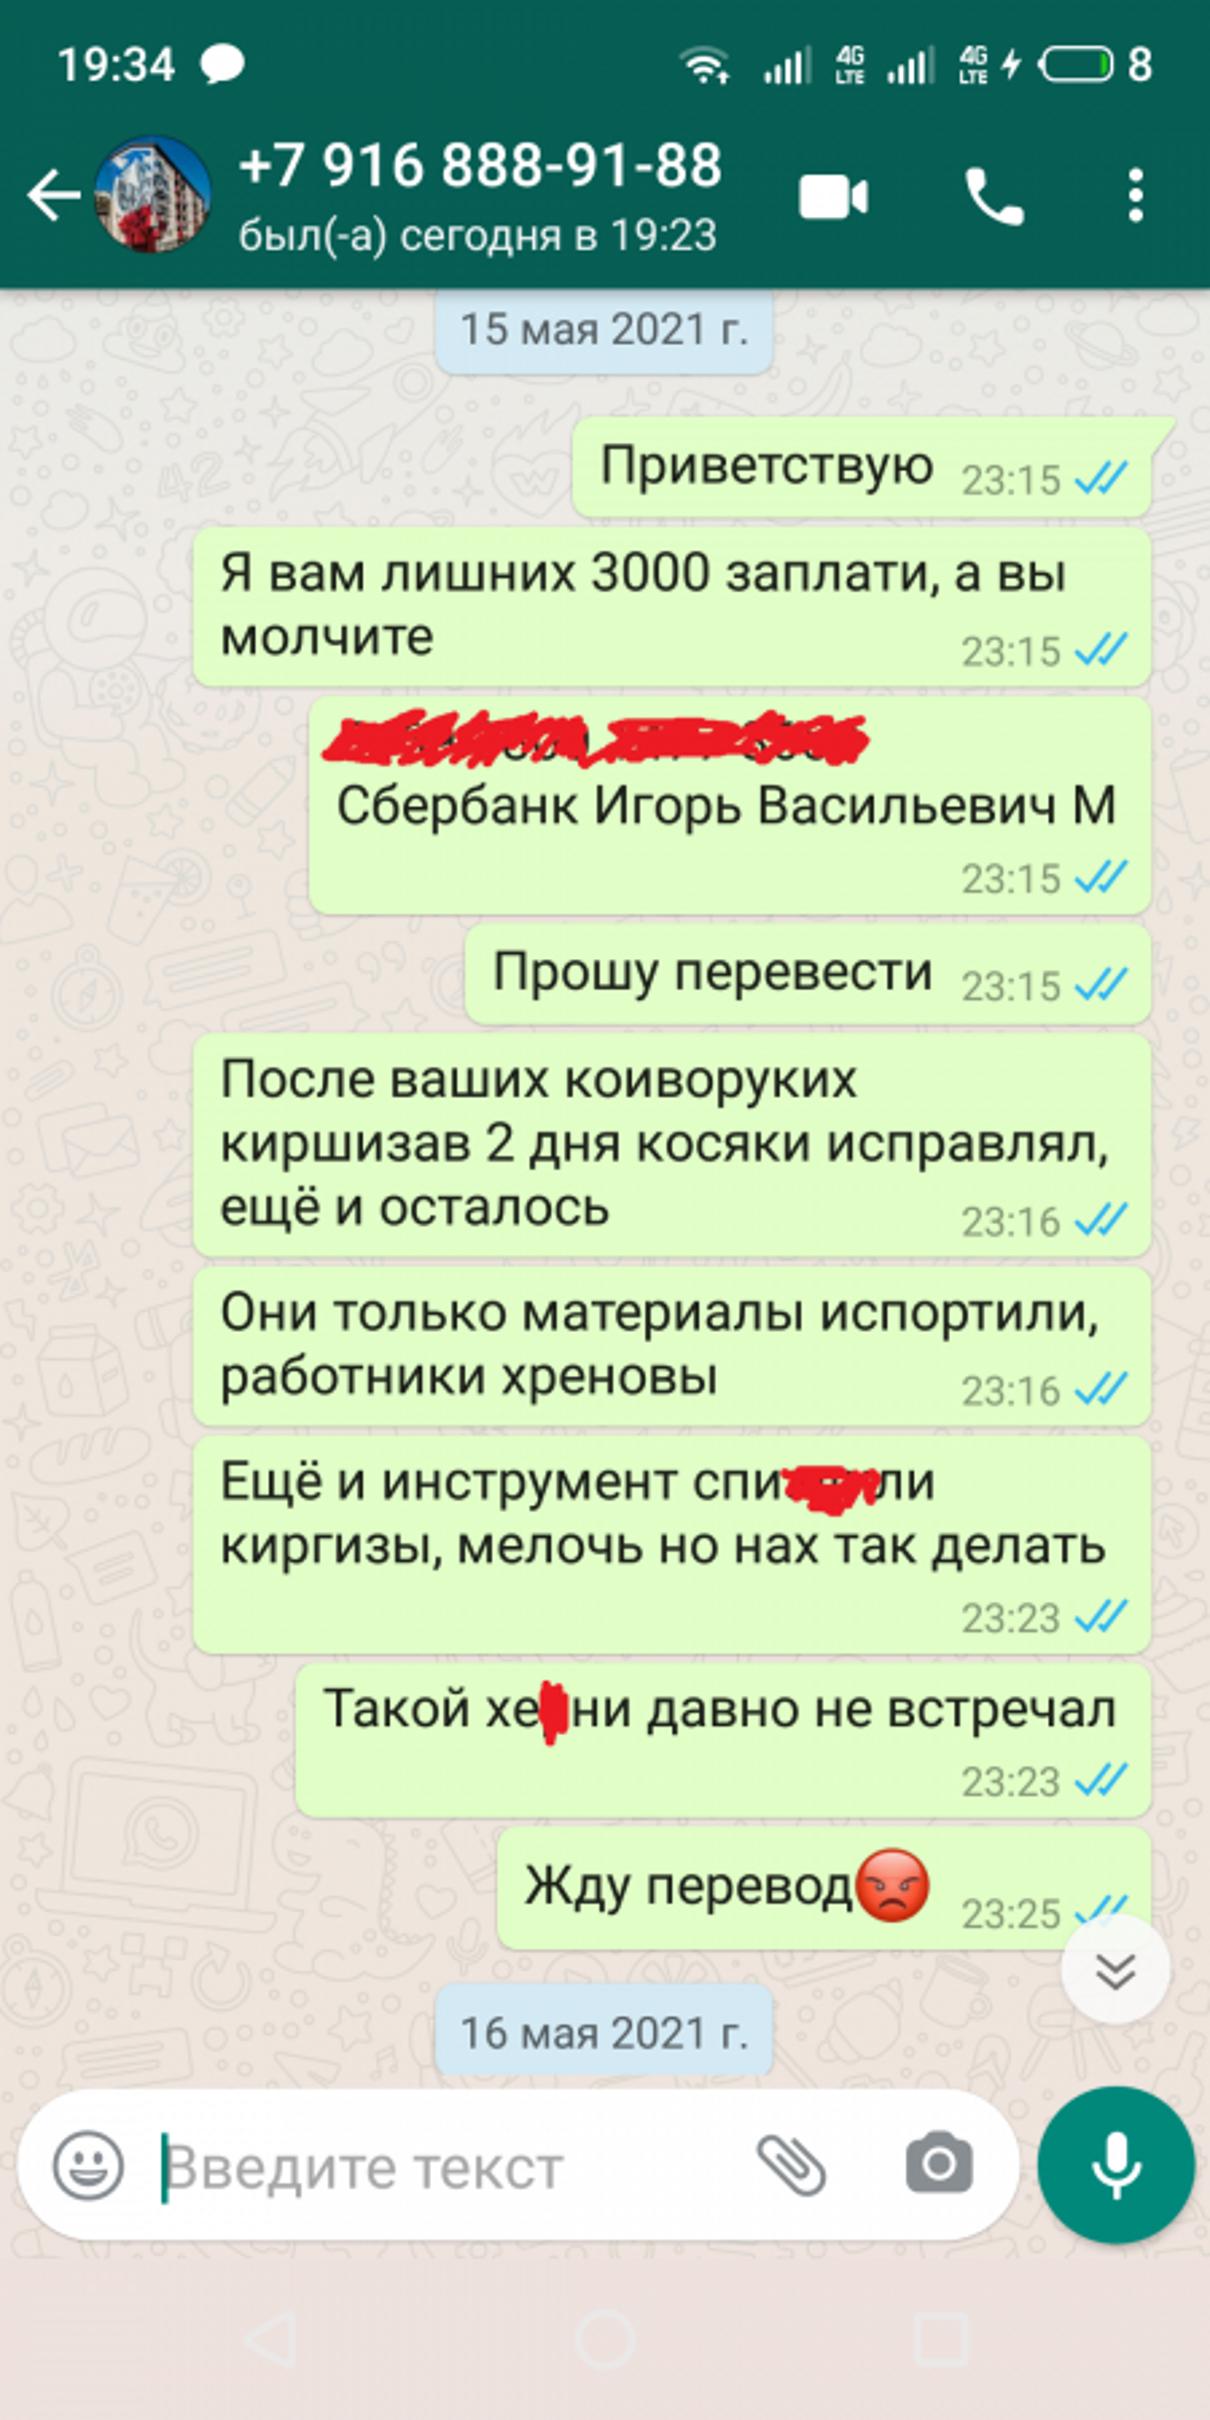 Жалоба-отзыв: Попков Дмитрий Юрьевич - Ремонт квартир - Кидалово